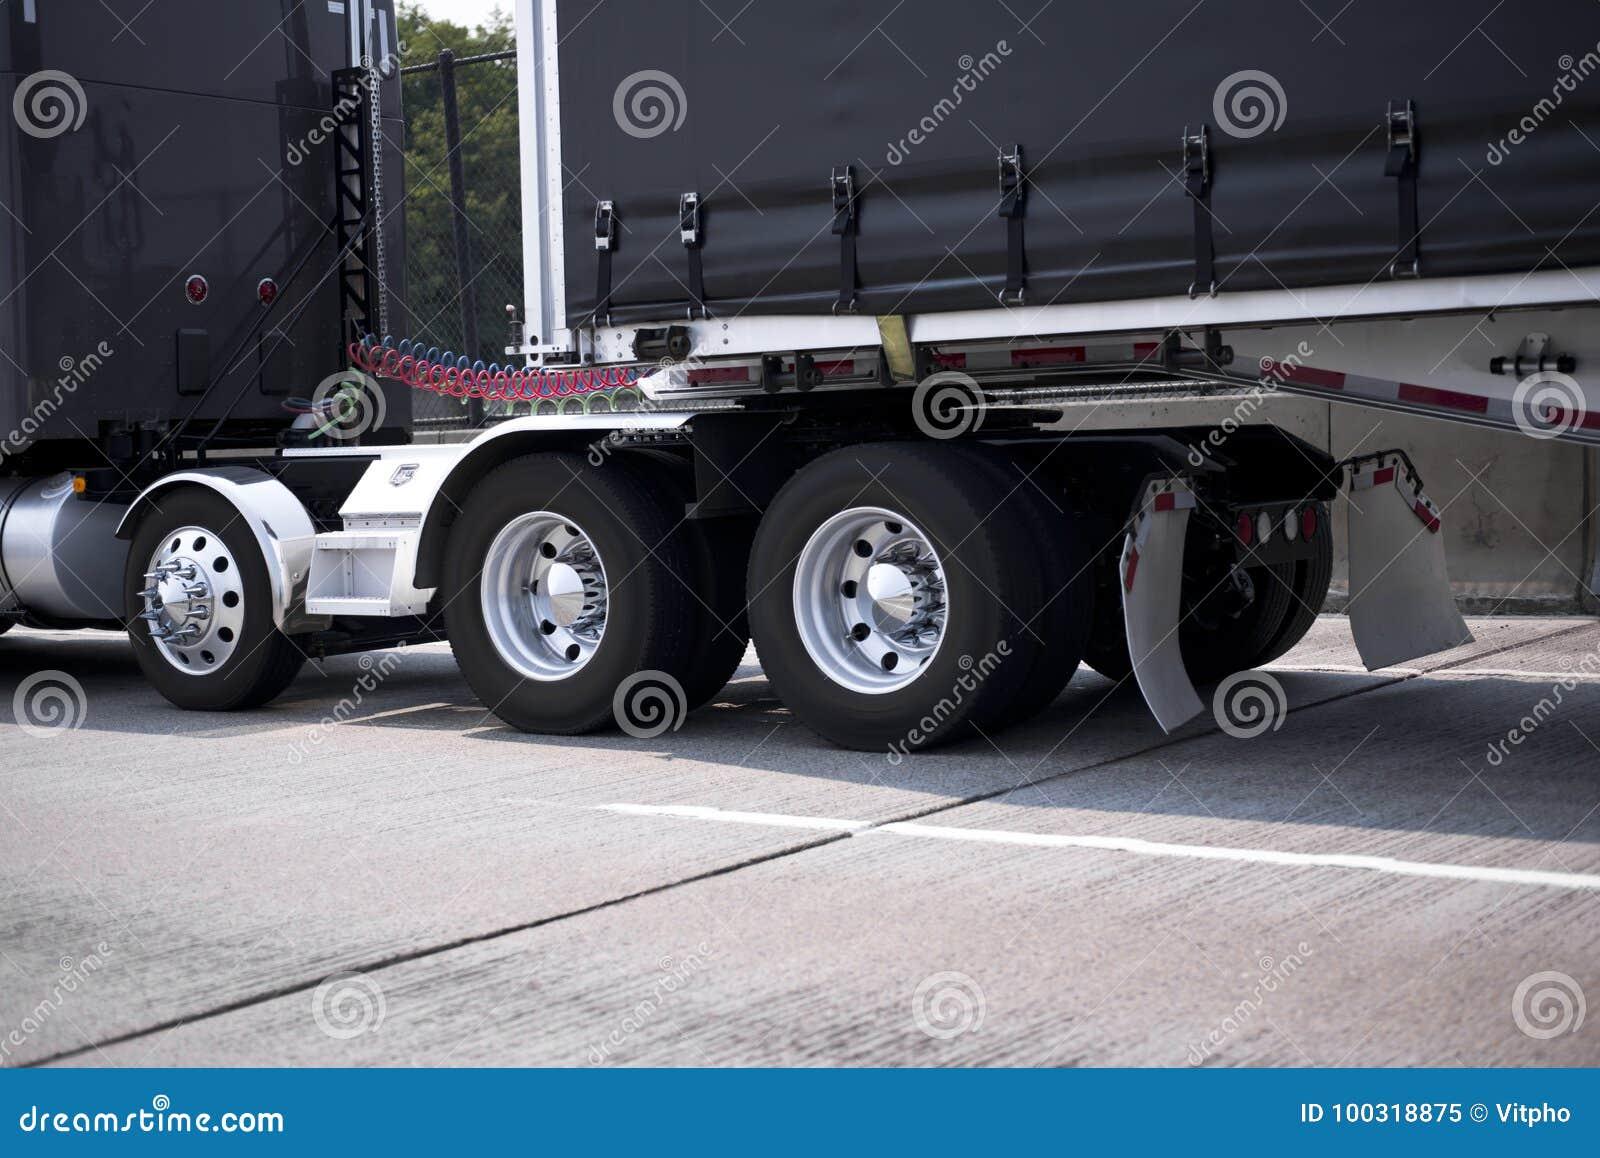 Big Rig Fenders : Black big rig semi truck with chrome wheels and fenders